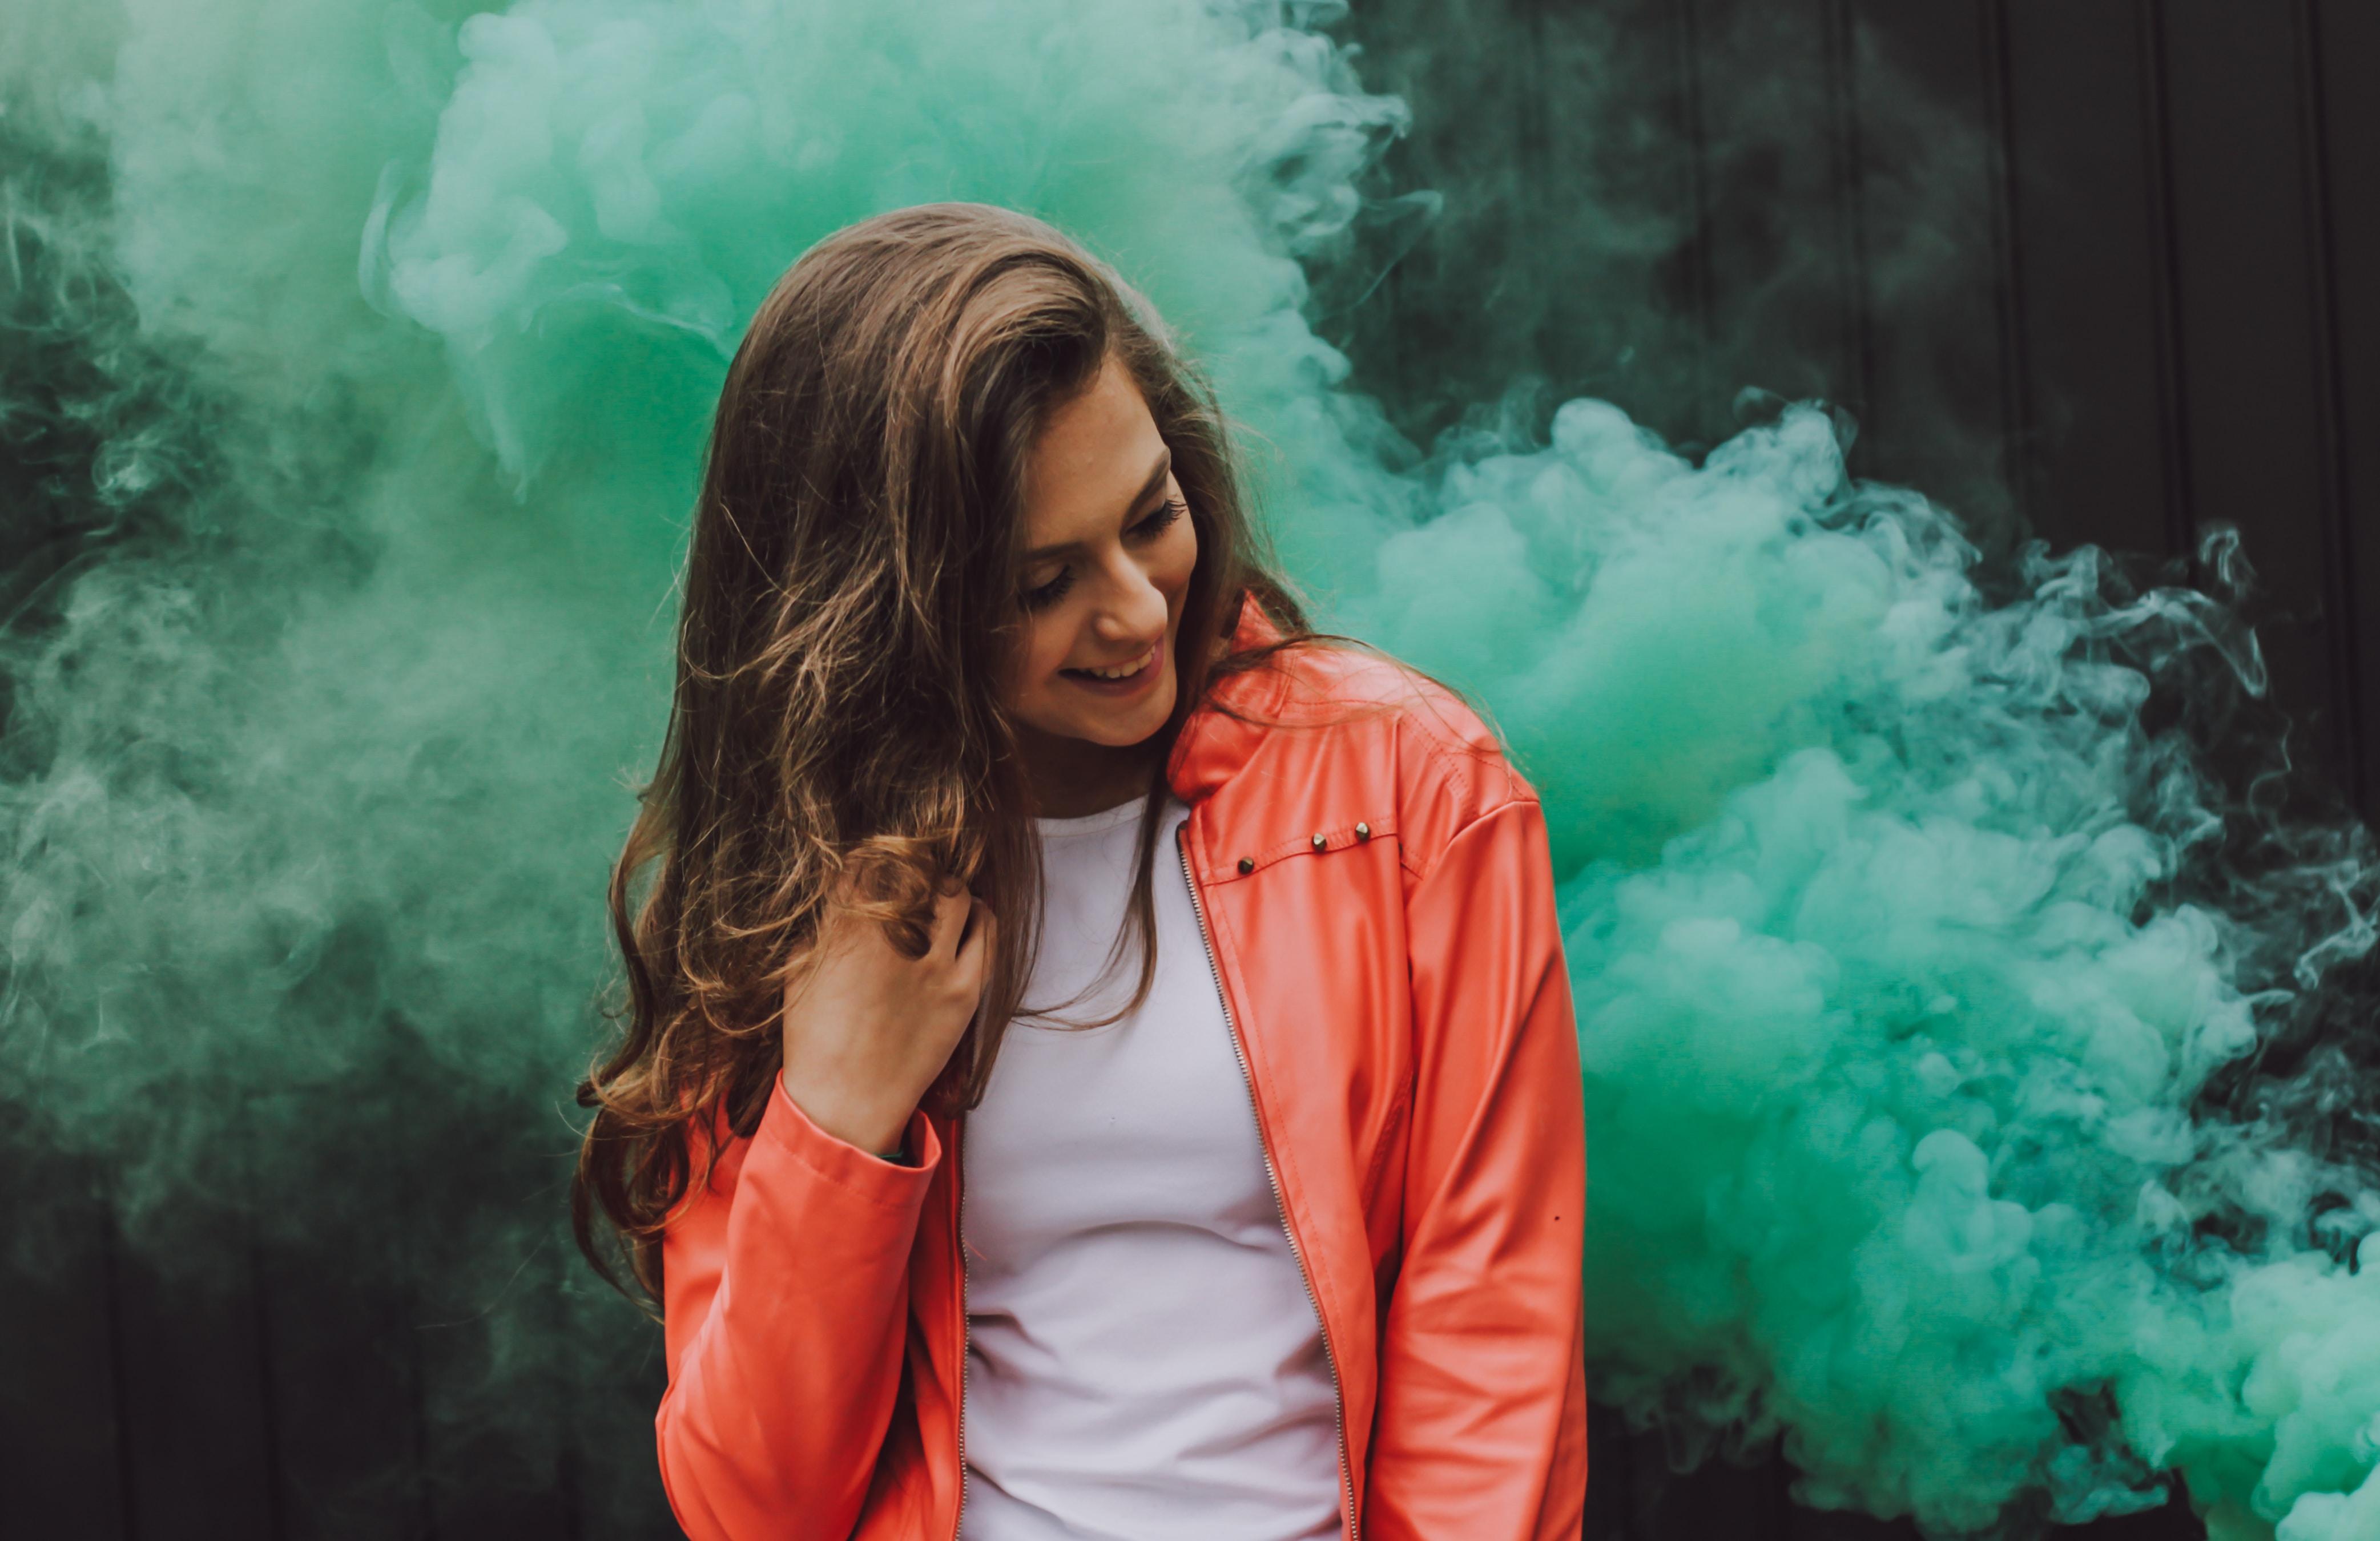 woman wearing orange leather jacket surrounded by green smoke